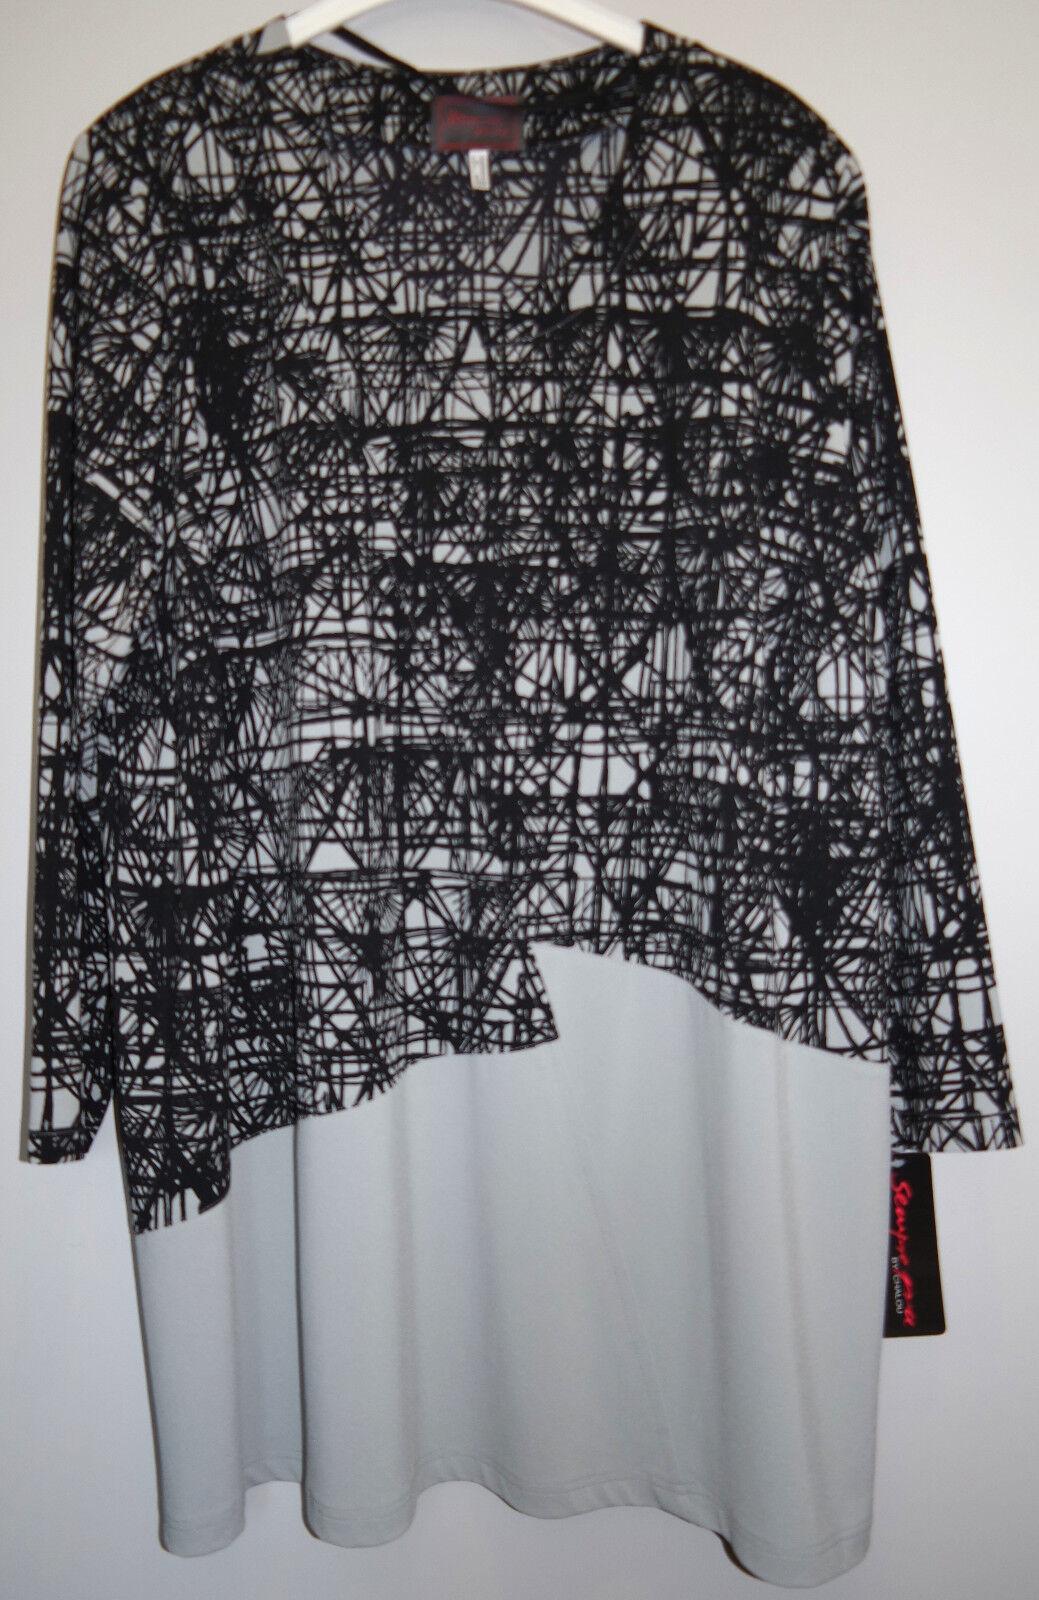 Shirt grau schwarz Gr.54 Marke Sempre Piu by Chalou Polyester rot.1 2 Preis